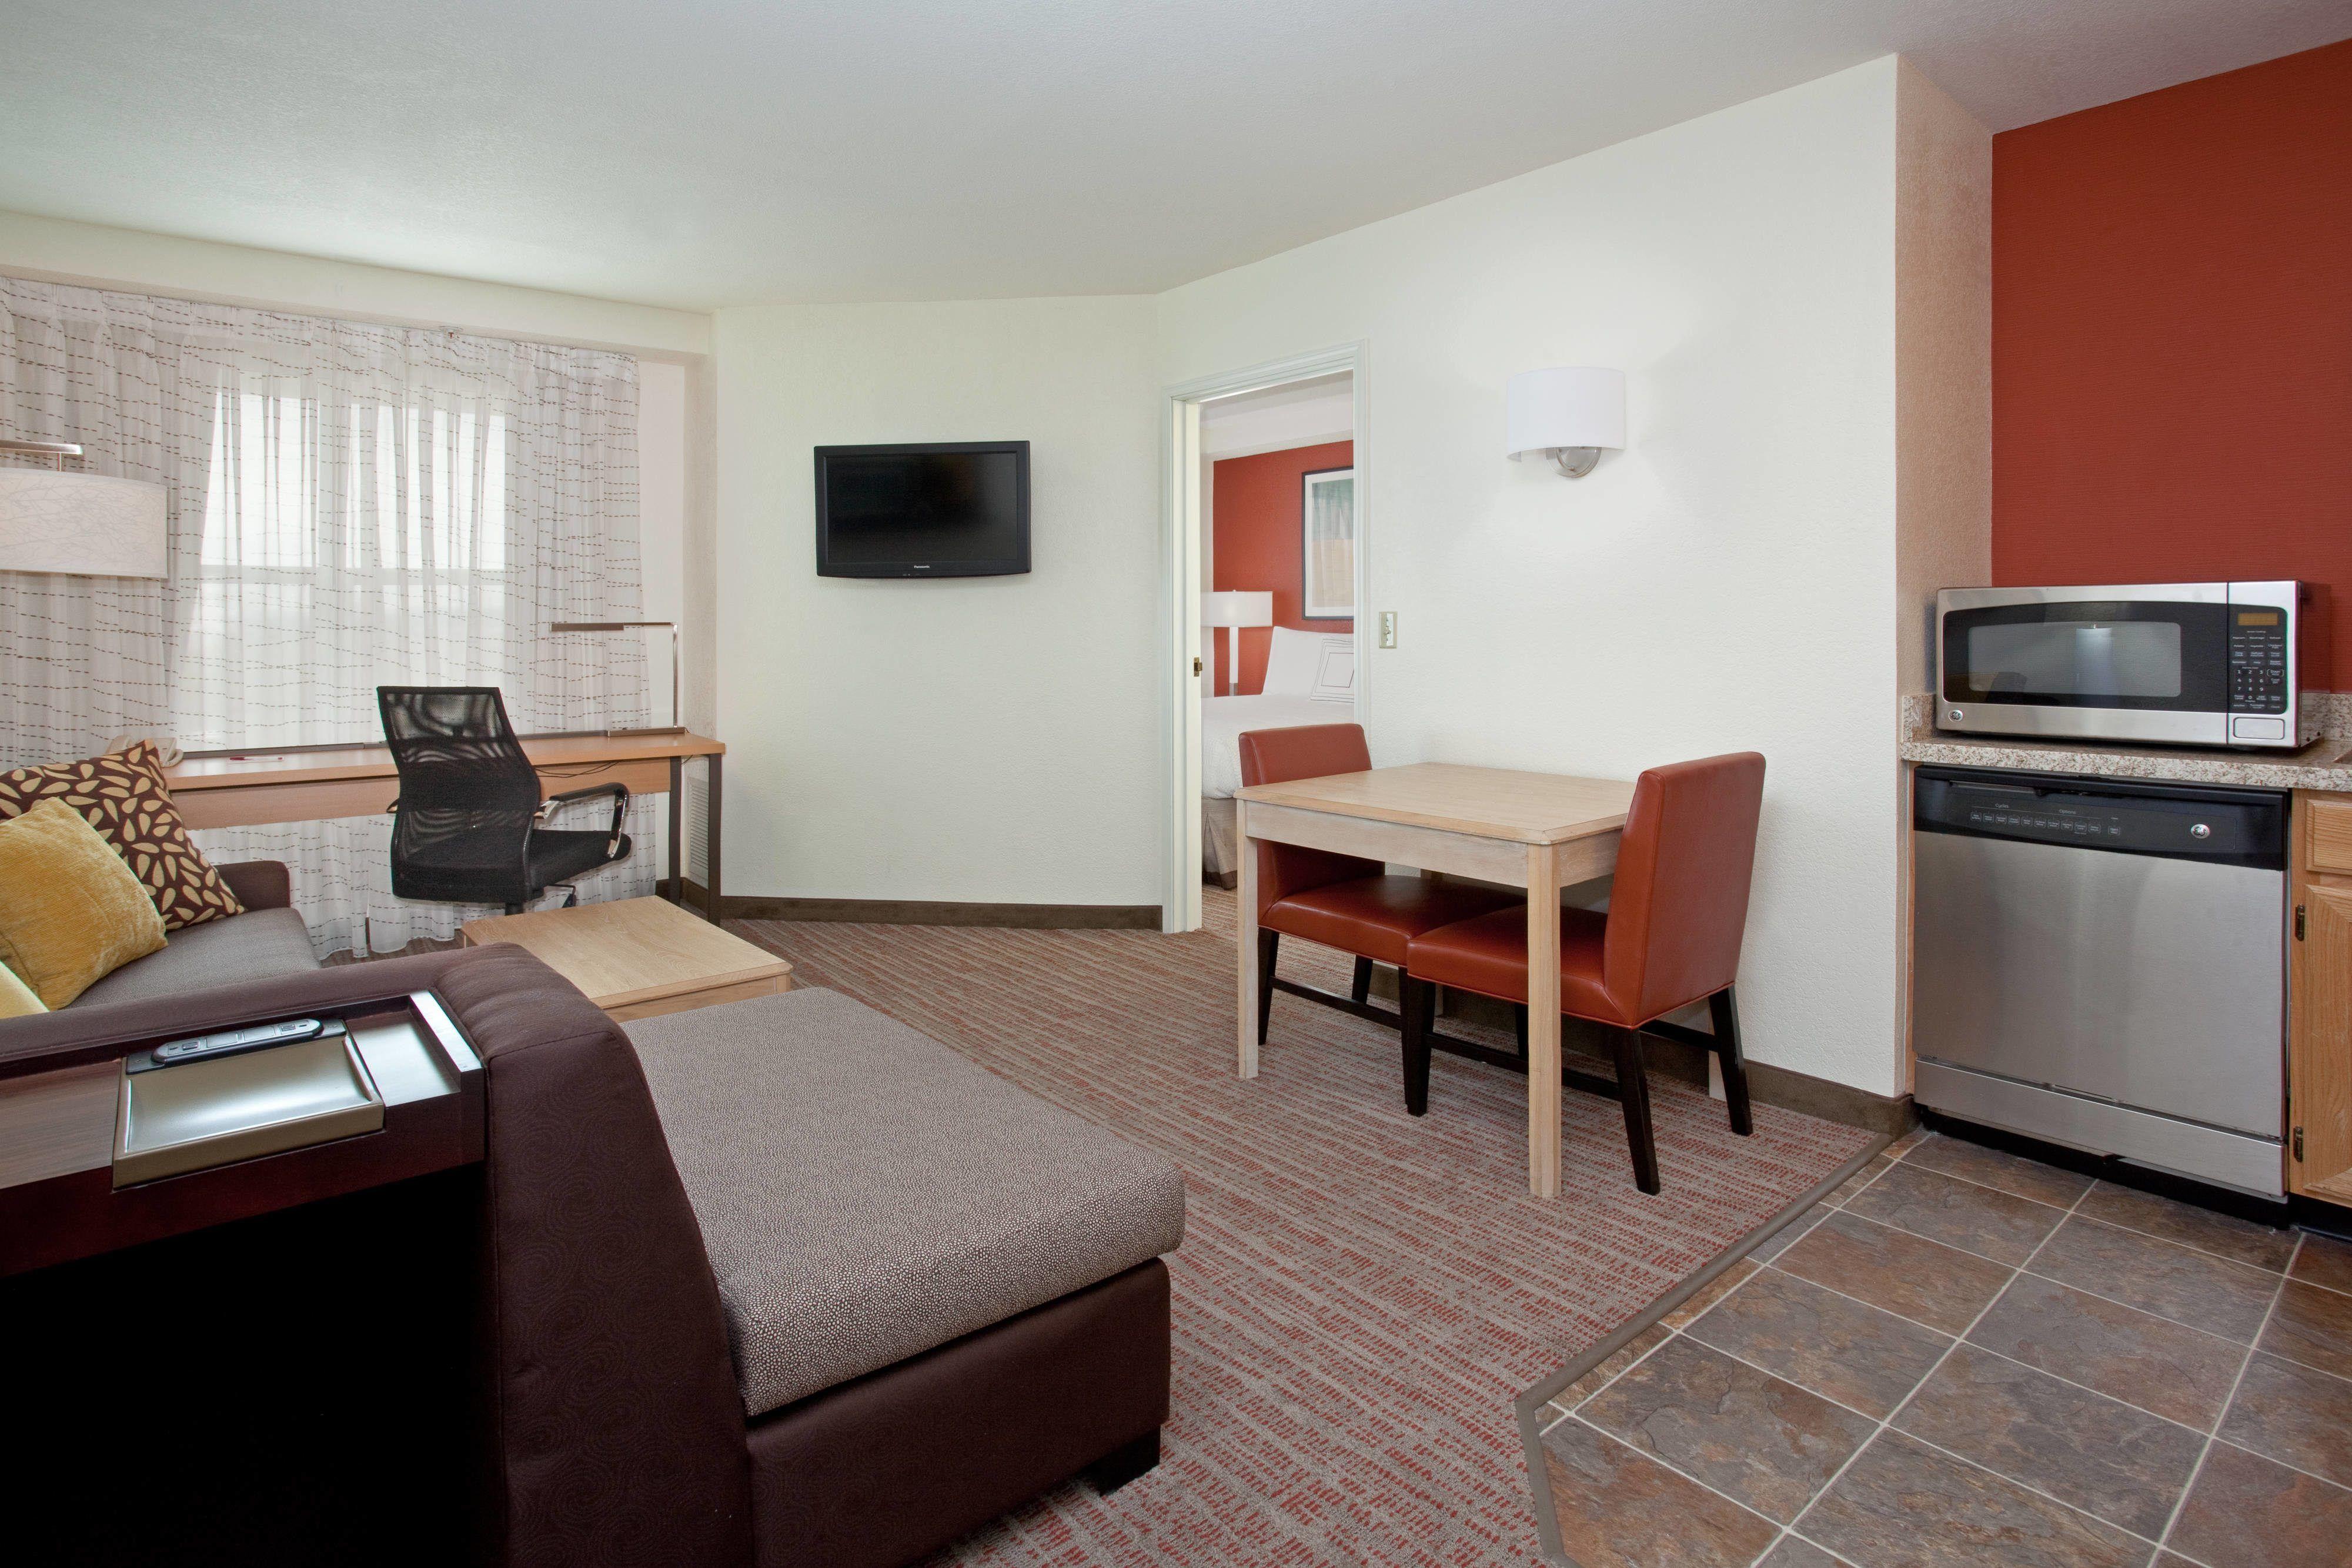 Residence inn salt lake city airport onebedroom suite hotel room